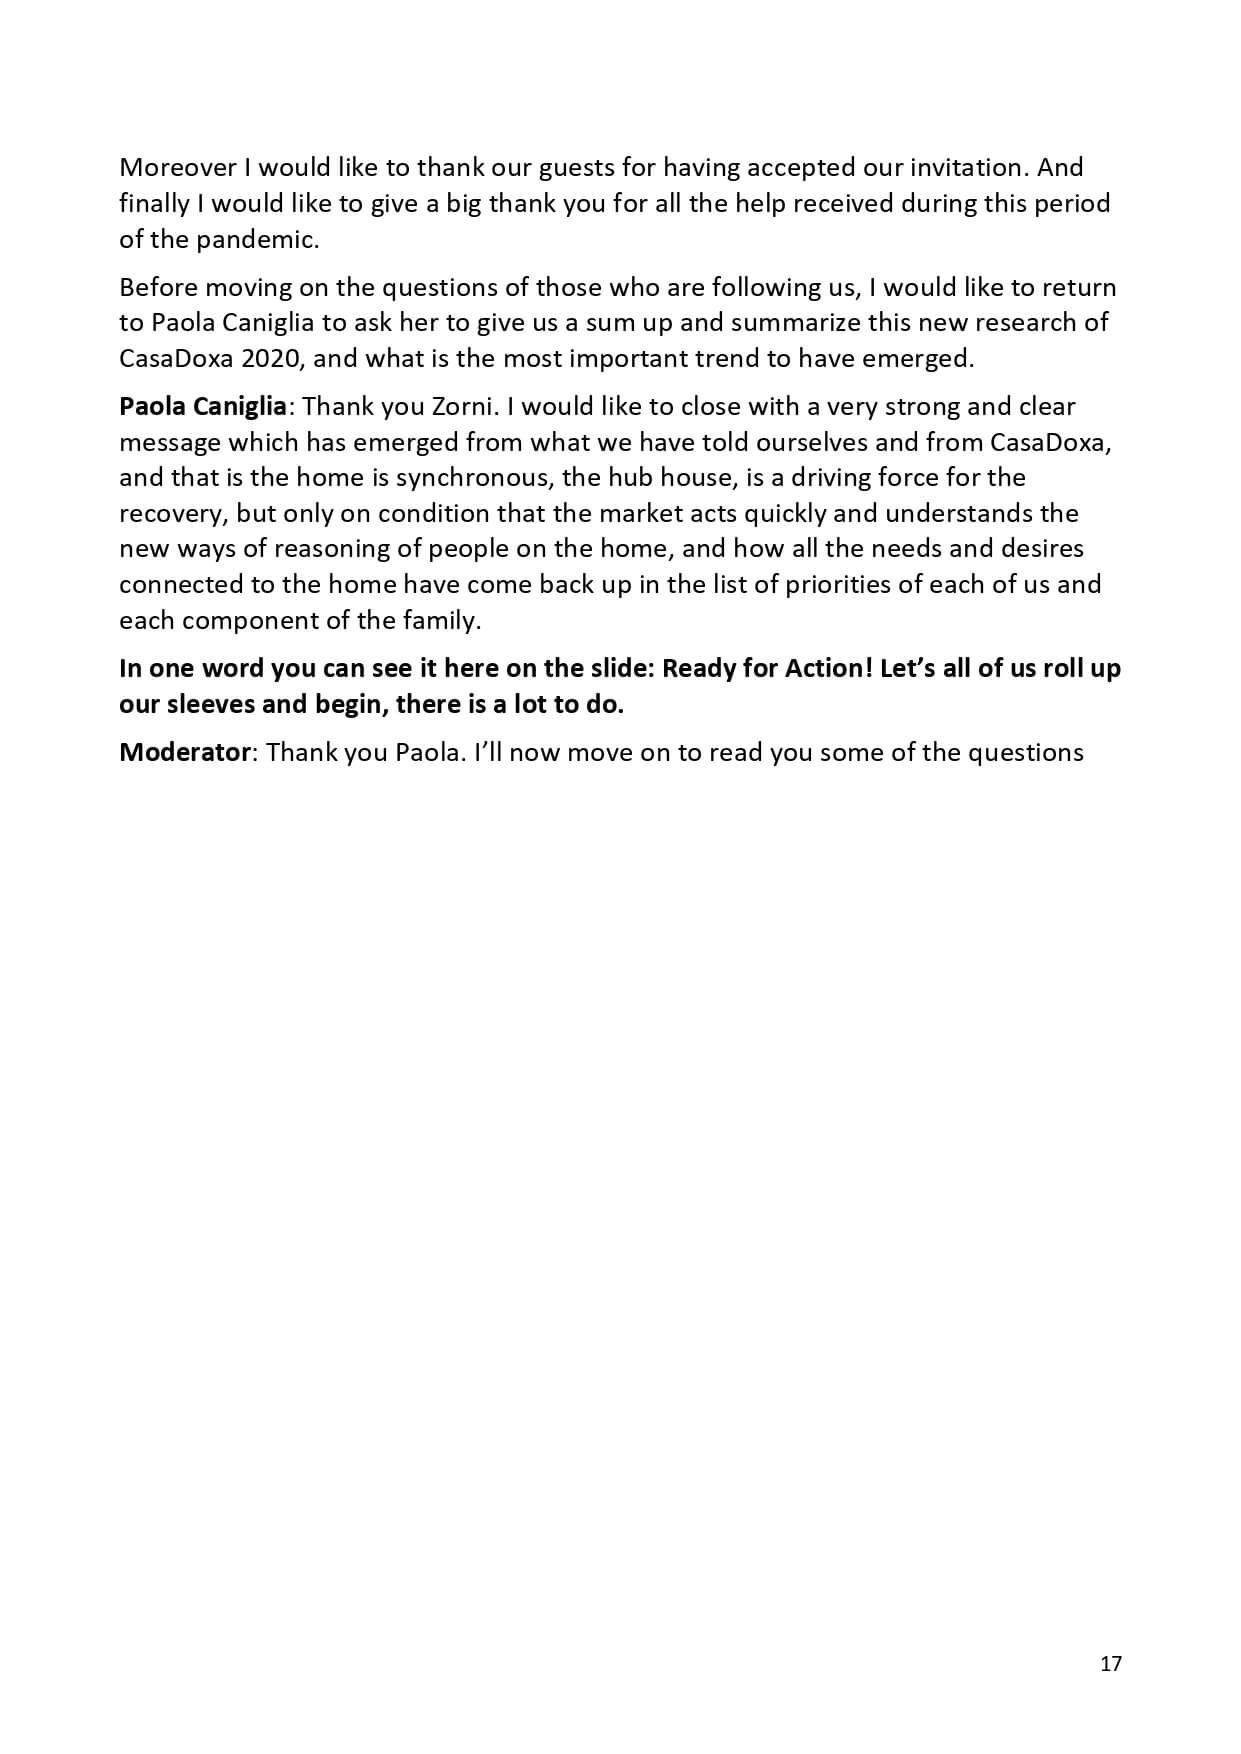 Casadoxa Webinar June 2020 English Pages To Jpg 0017